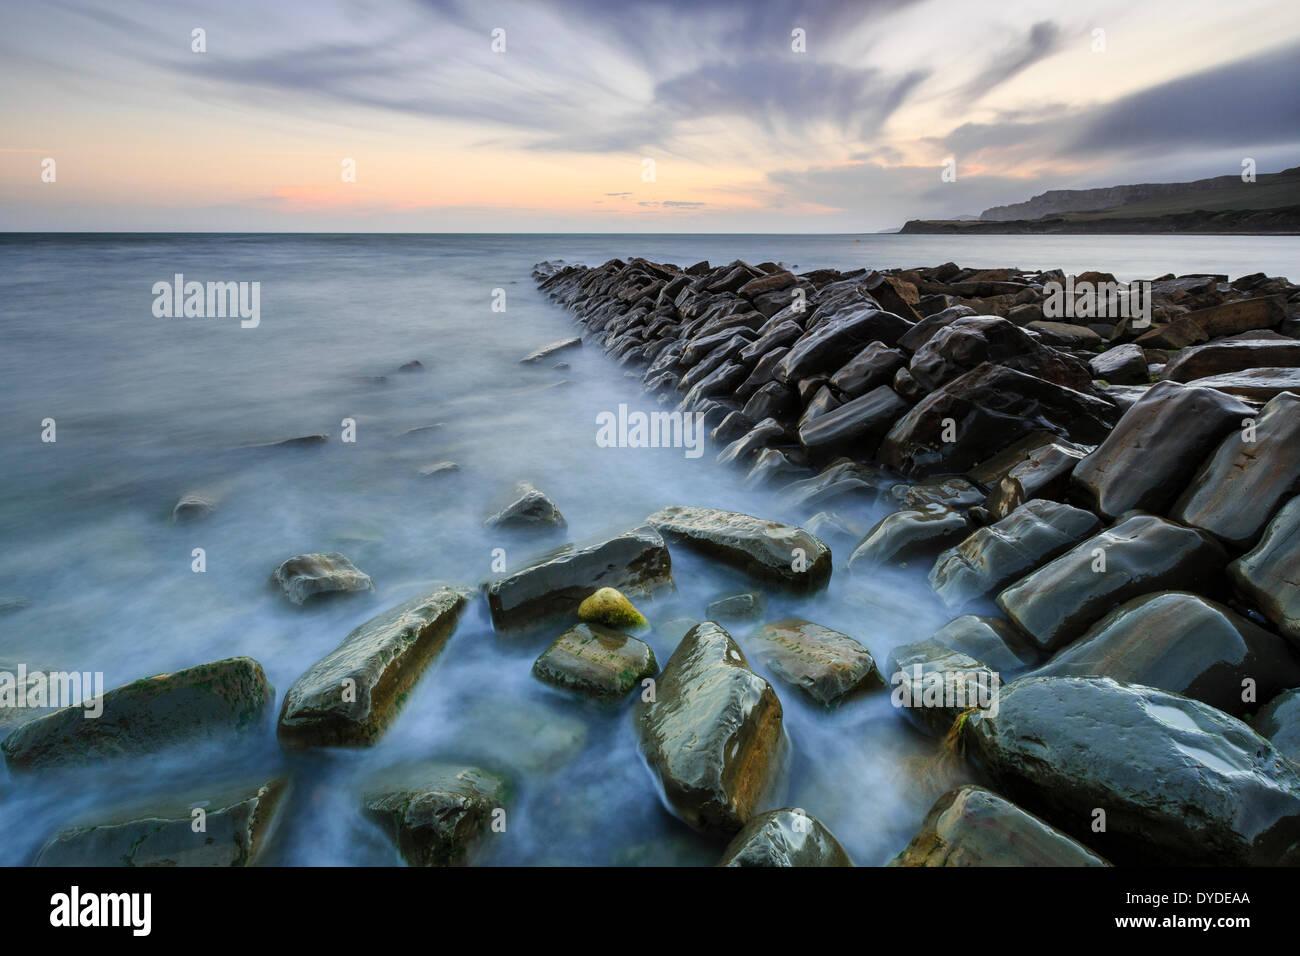 Sunset at Kimmeridge Bay in Dorset. - Stock Image